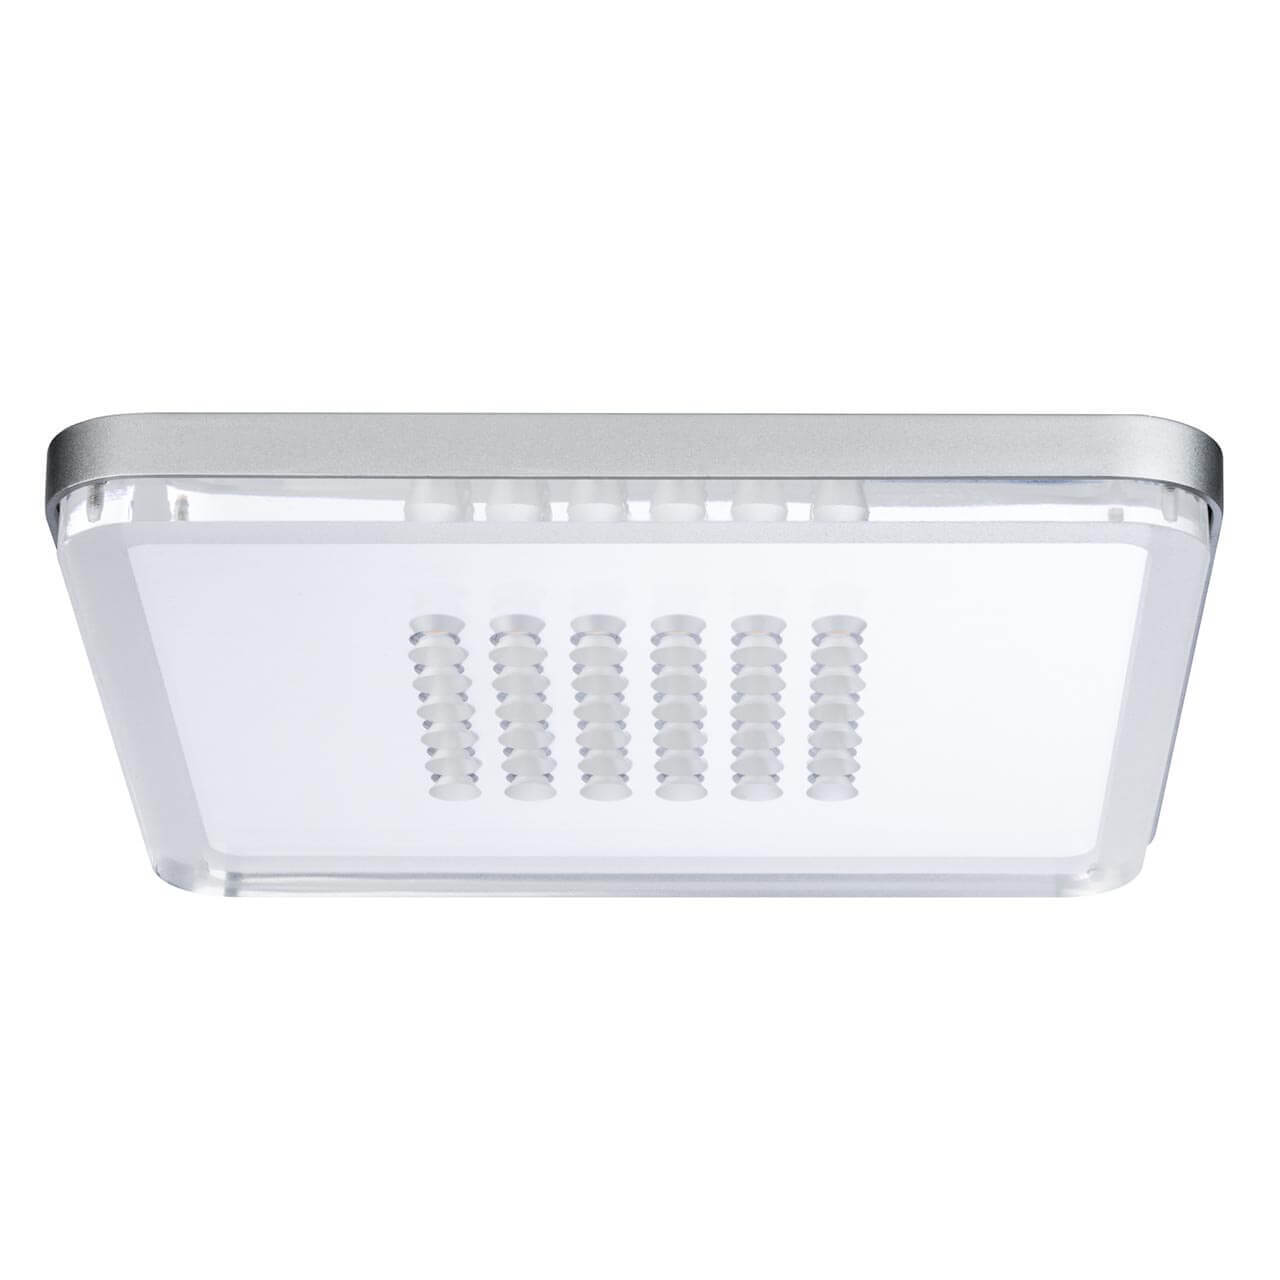 Светильник Paulmann 92791 Panel Shower